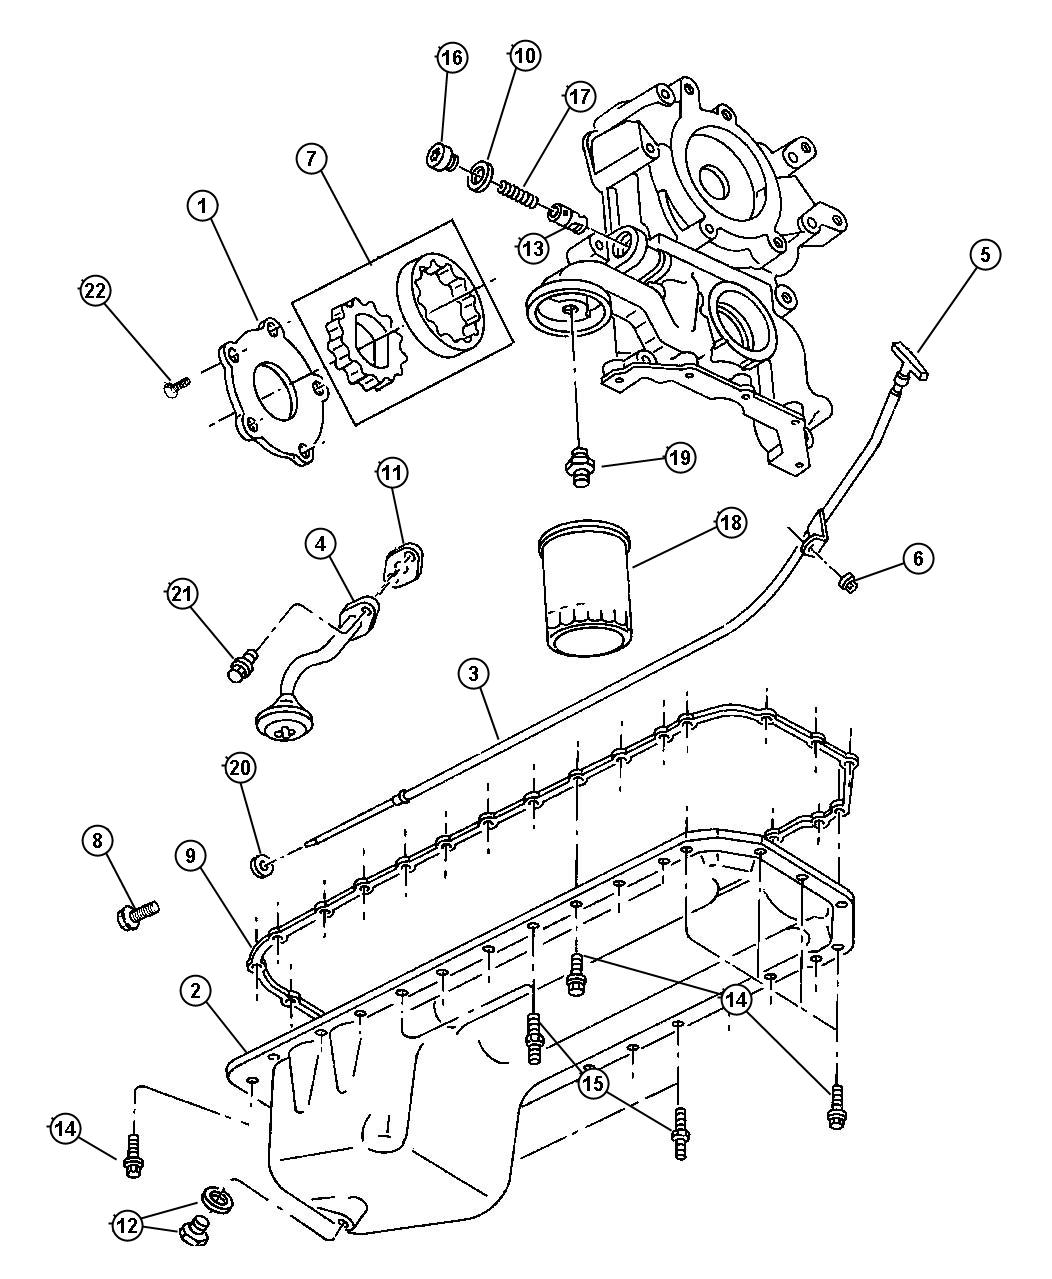 1999 Dodge Ram 3500 Plunger. Oil pressure relief valve